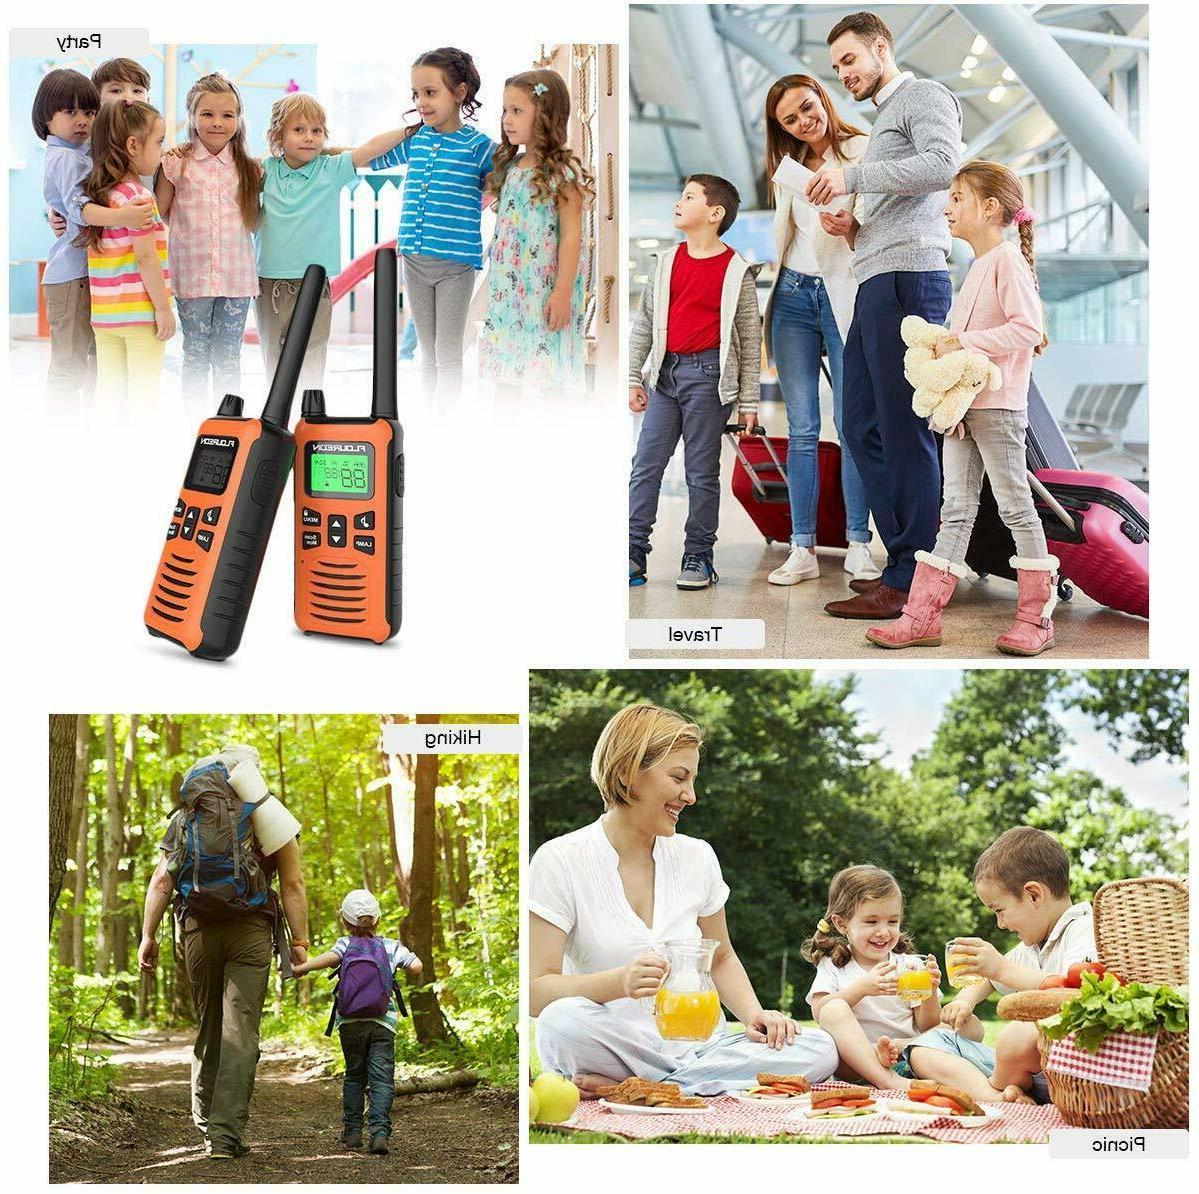 FLOUREON Radios Walkie Talkies Children Rechargeable 22 Channel 2/pk